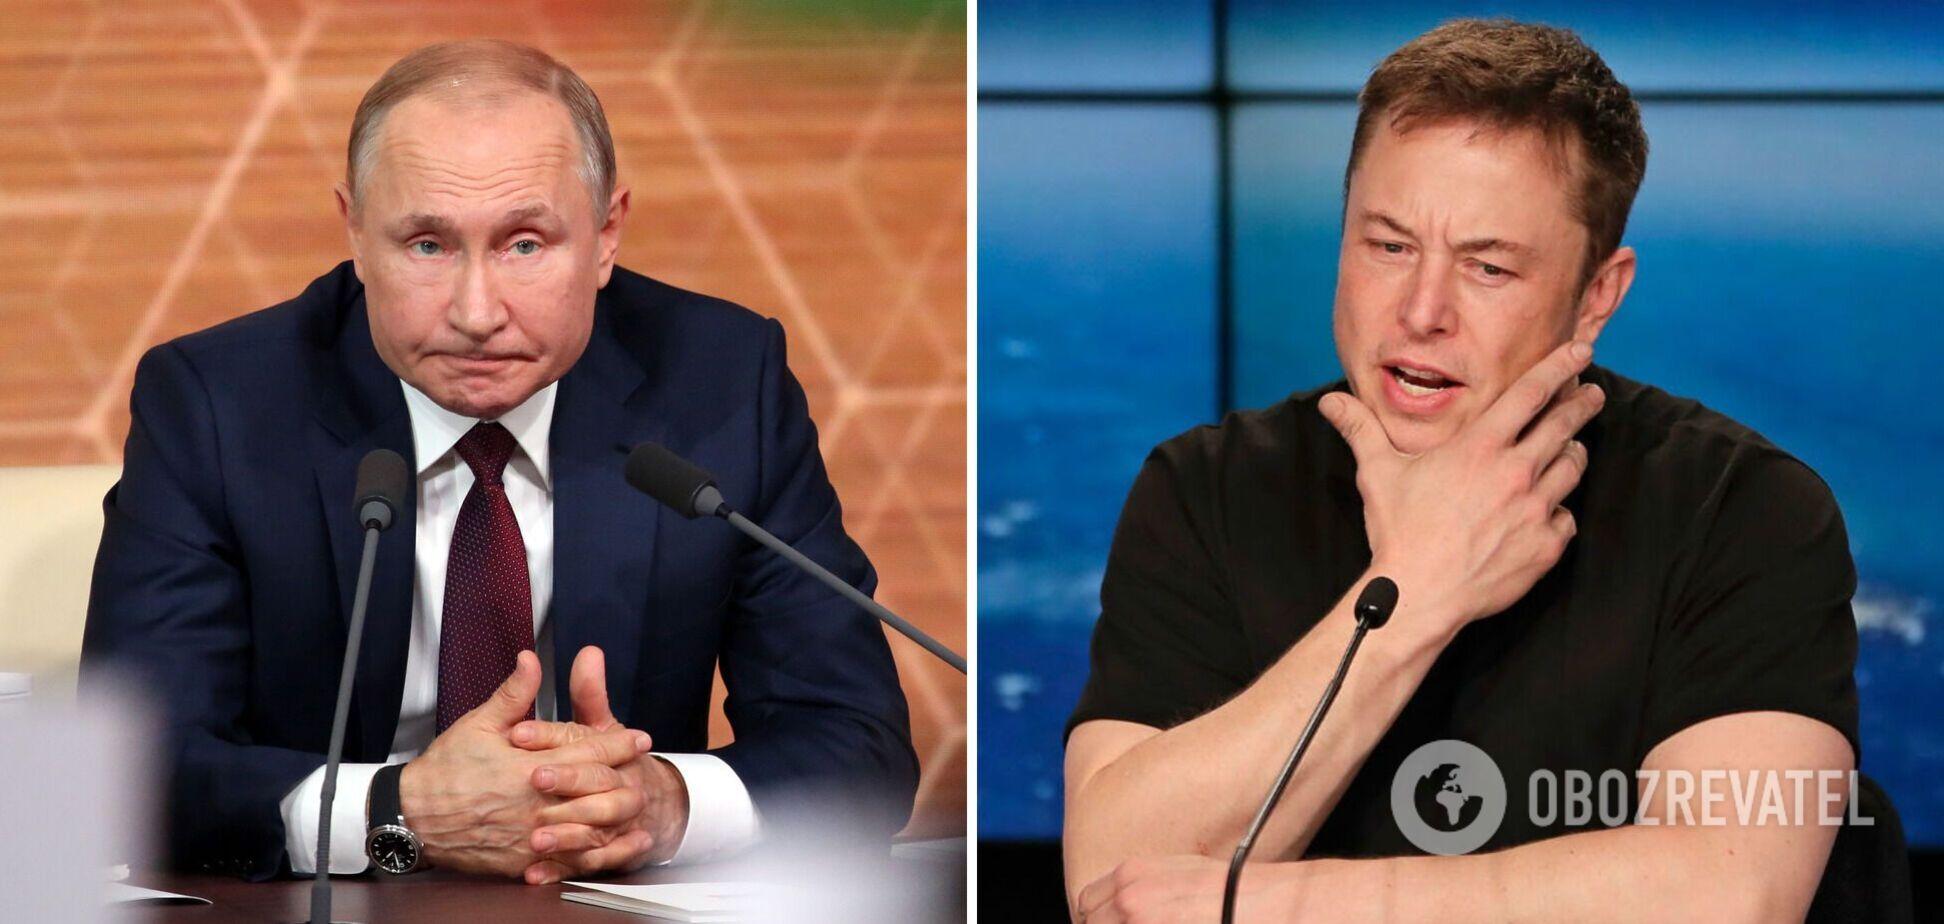 Владимир Путин и Илон Маск